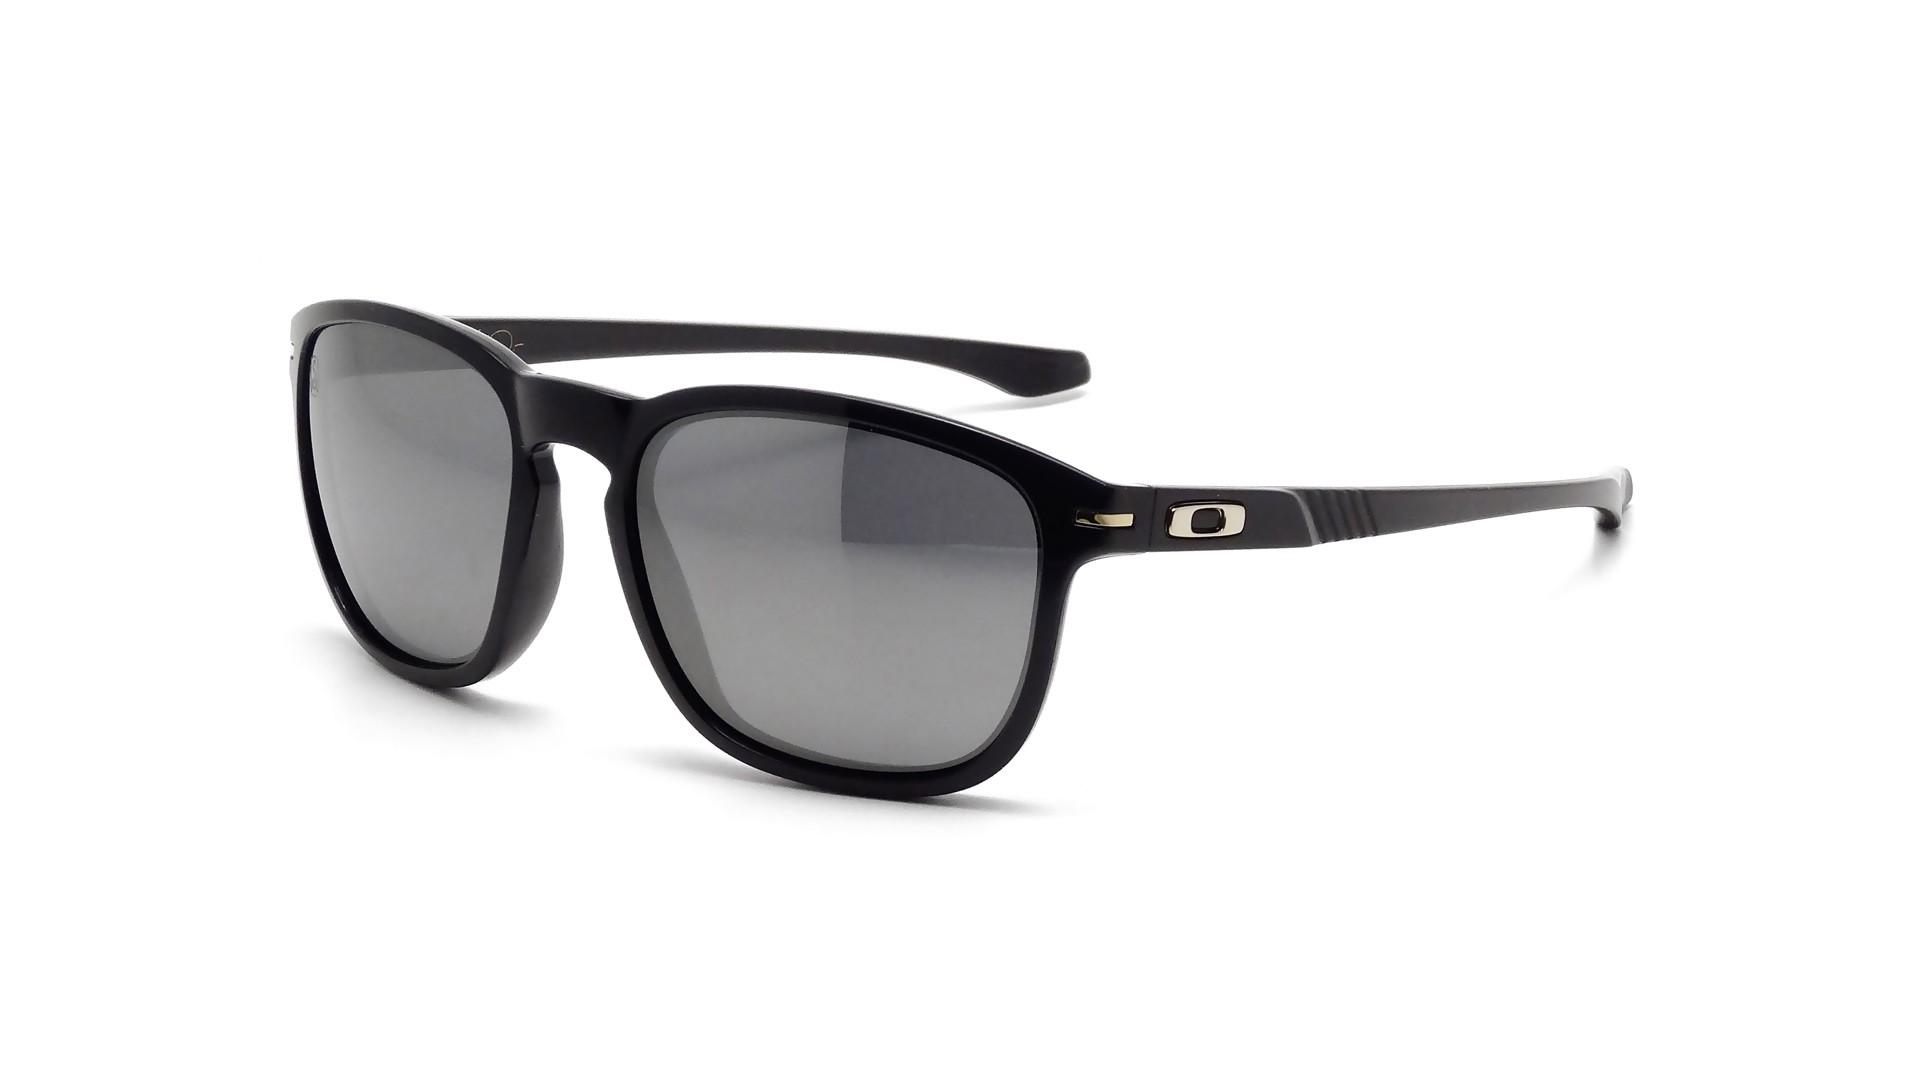 71f4e3ea13 Oakley Shaun White Gold Series Enduro Polished Black Sunglasses ...